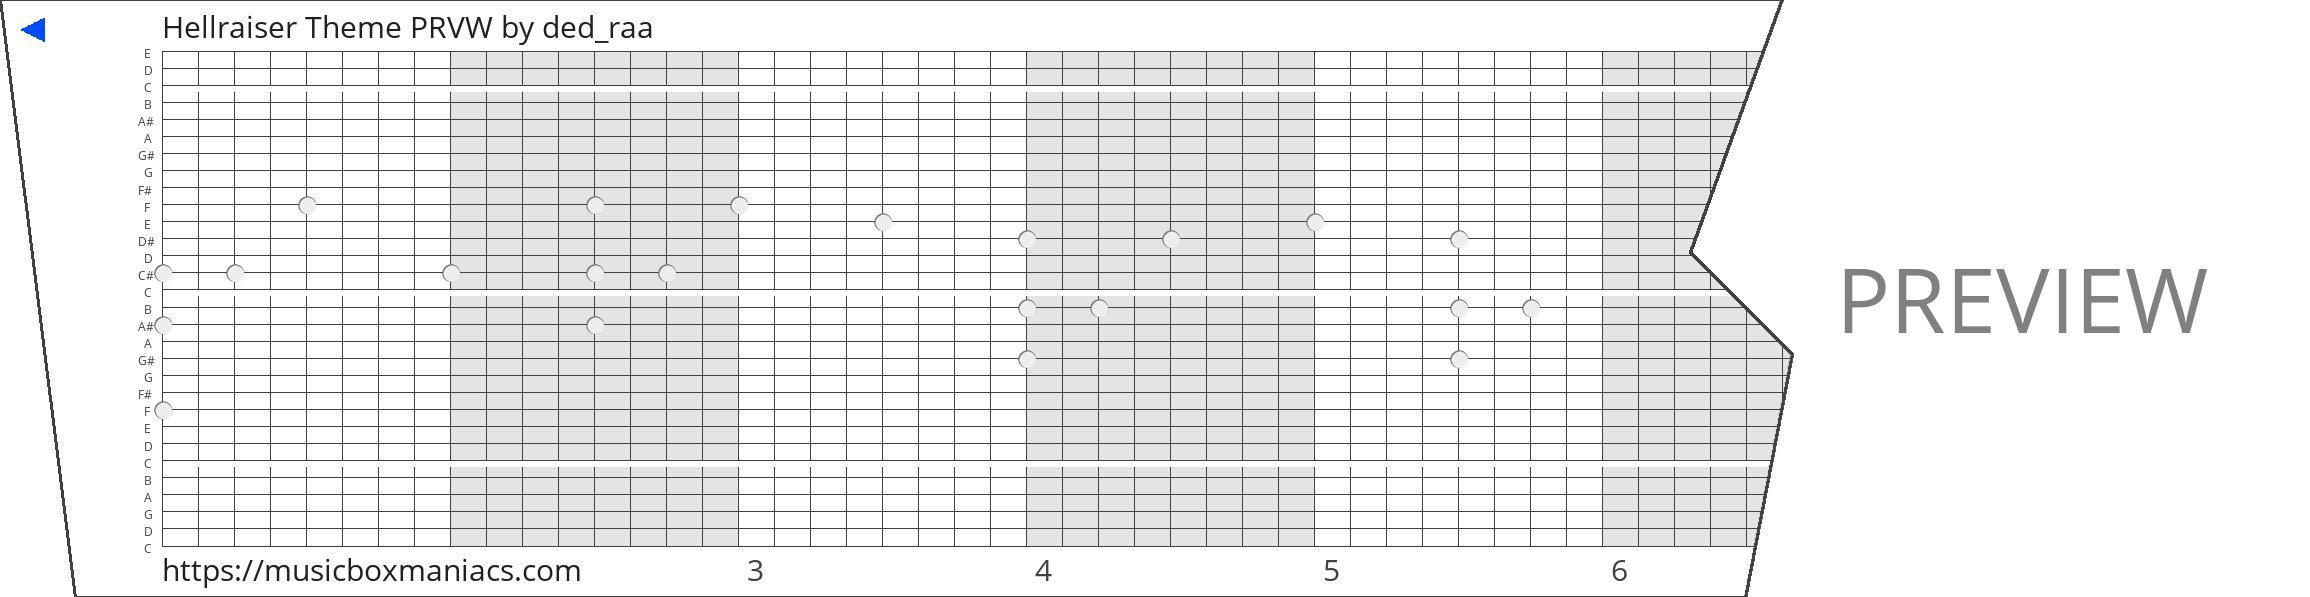 Hellraiser Theme PRVW 30 note music box paper strip